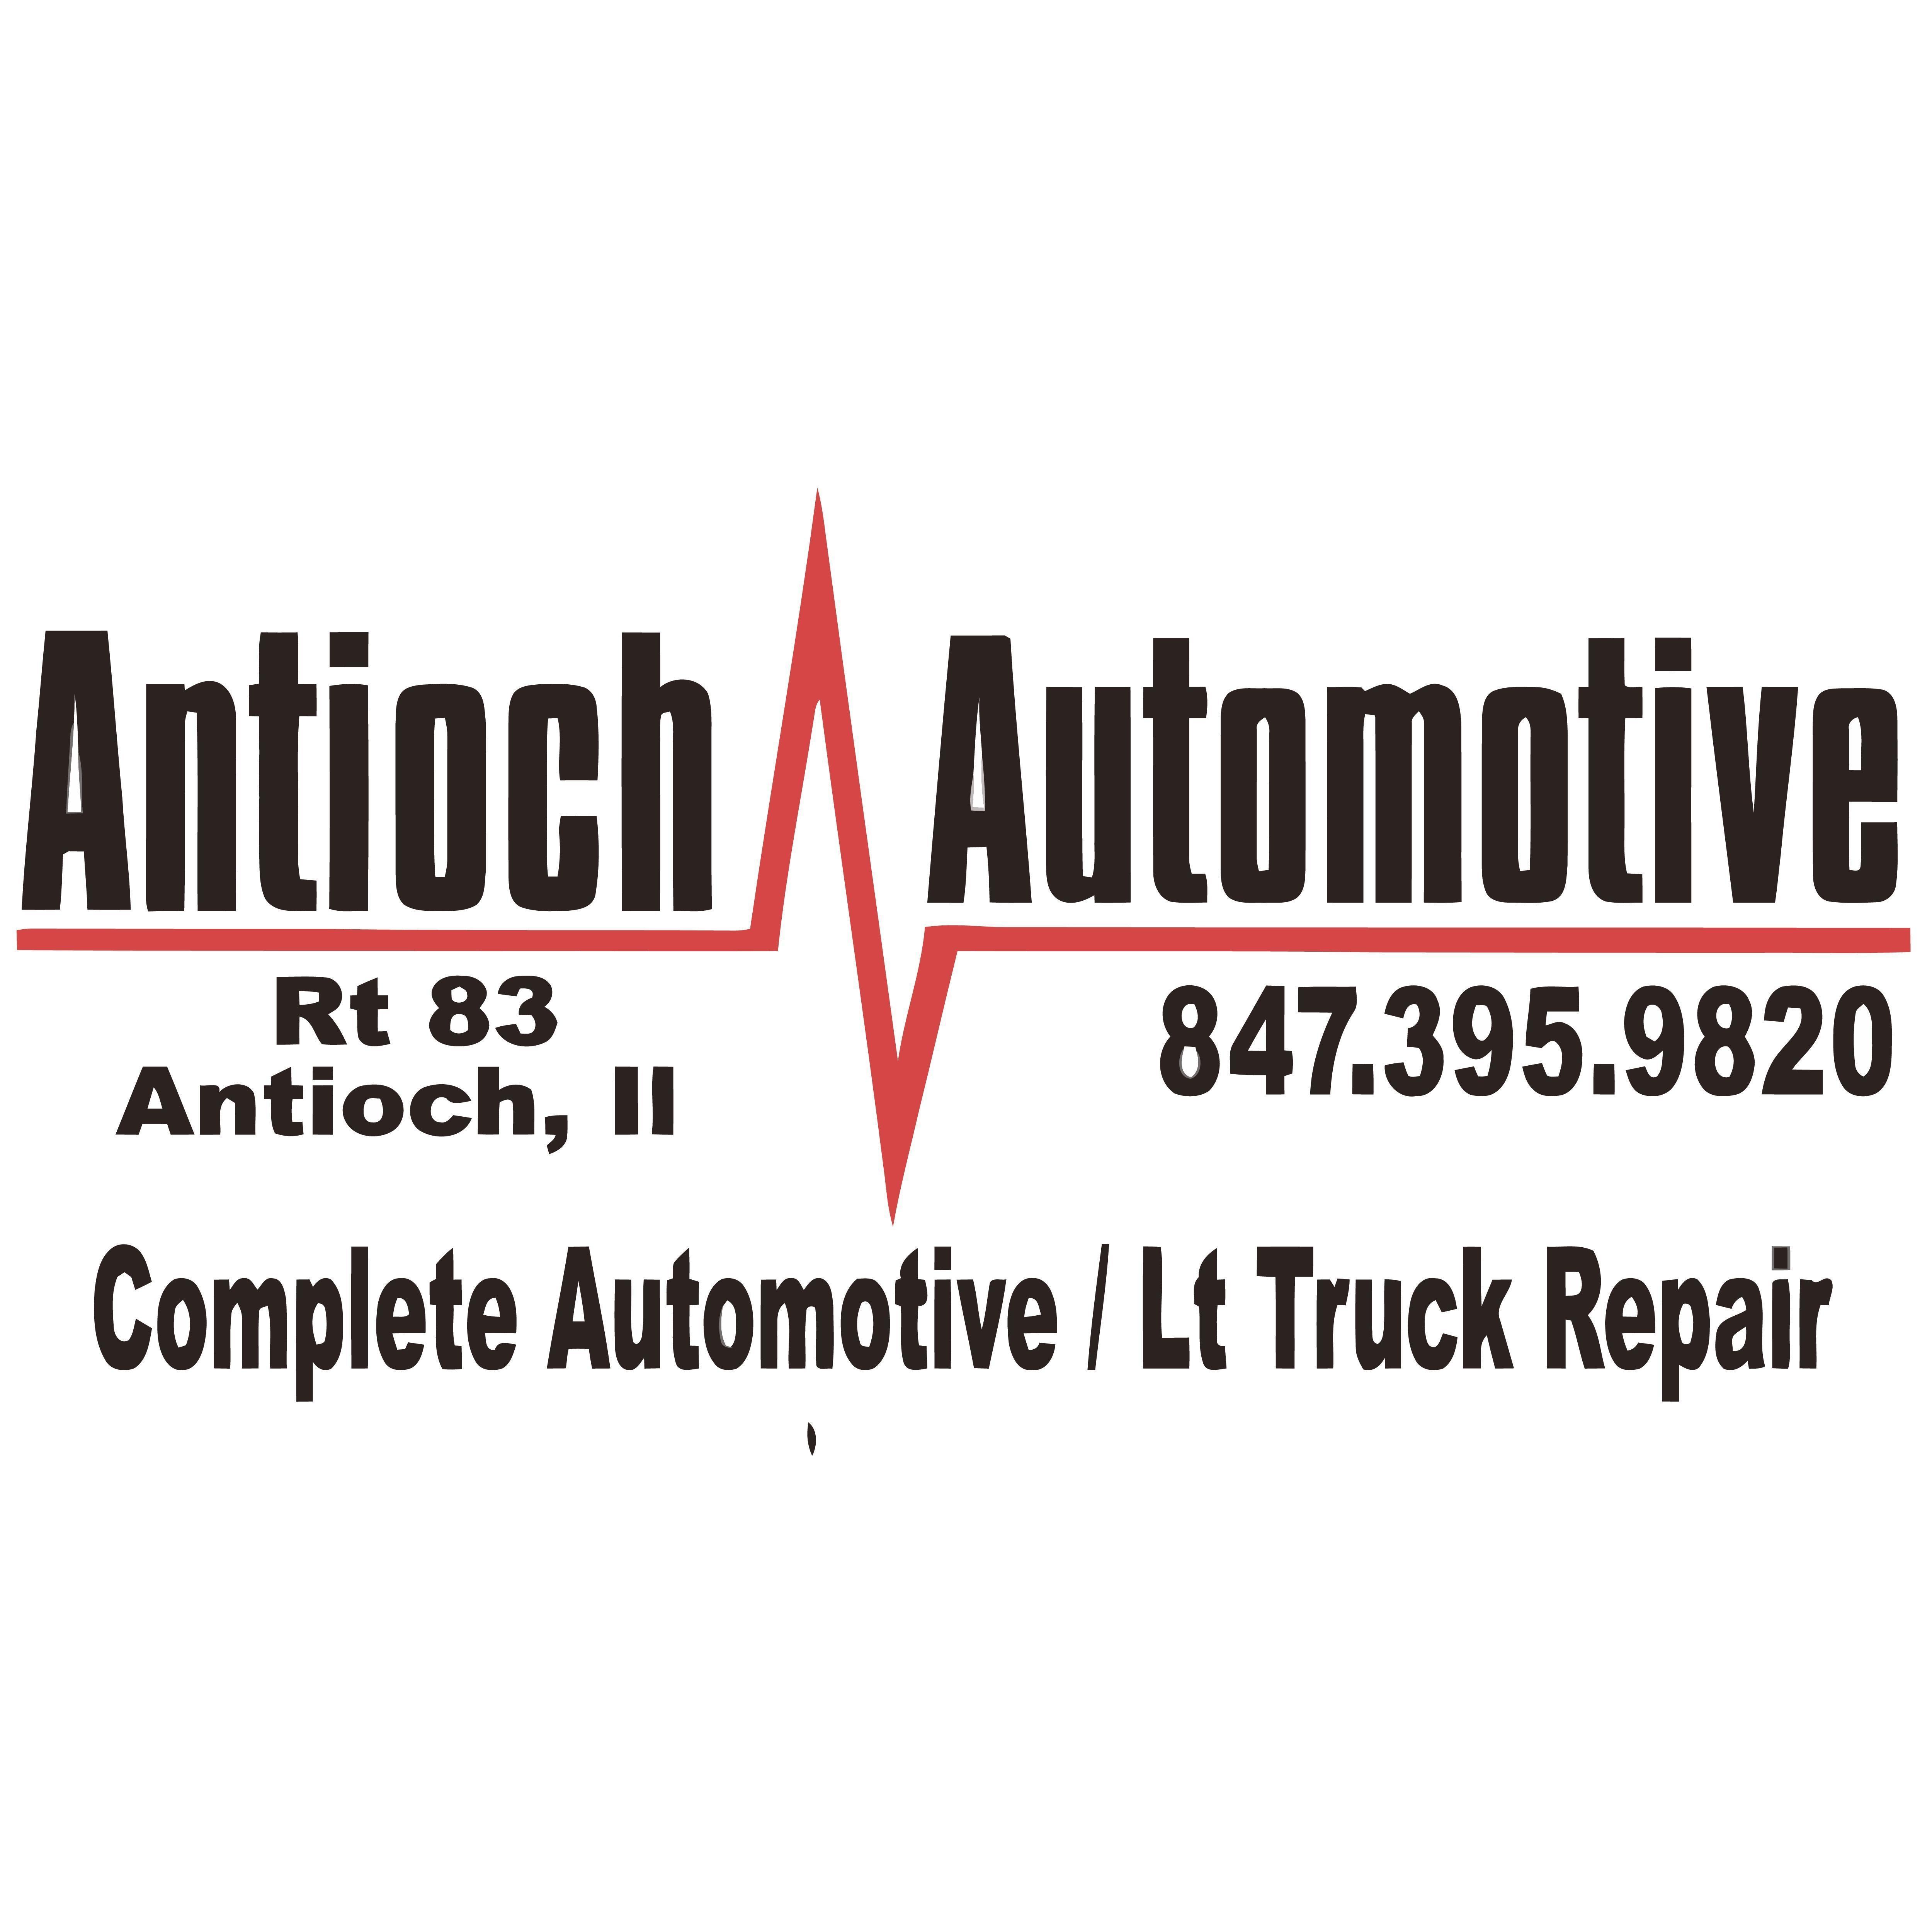 Antioch Automotive